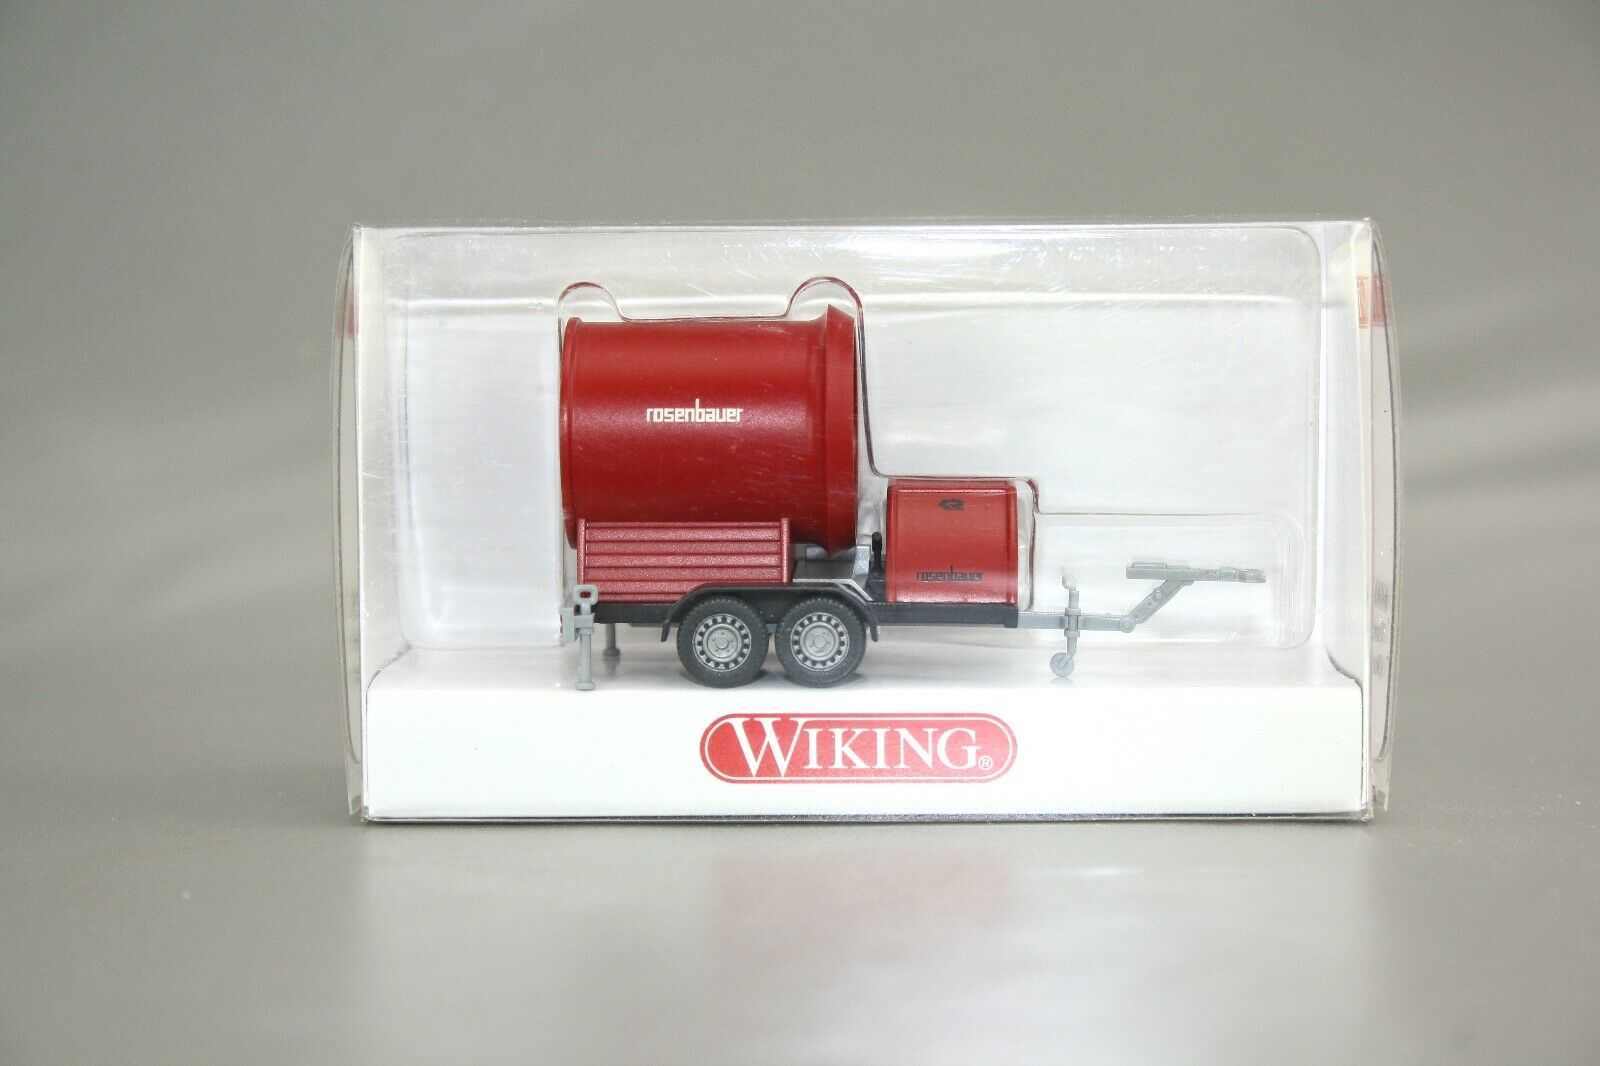 Wiking 1:87 600 08 Tunnel Ventilateur roses BAUER neuf dans sa boîte